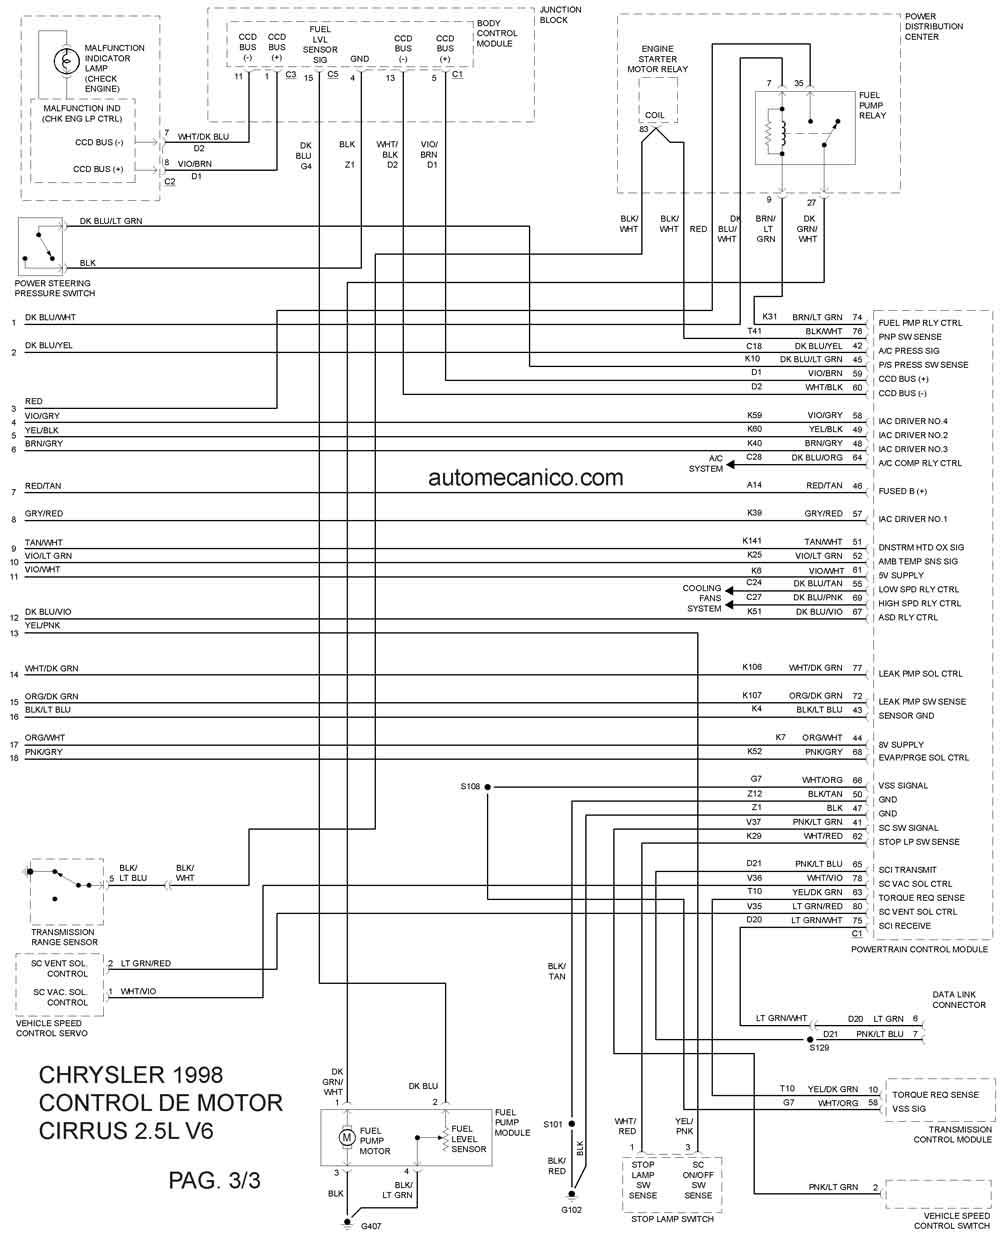 2006 Pt Cruiser Wiring Diagram - 11.13.tramitesyconsultas.co •  Chrysler Pt Cruiser Wiring Diagram Fuel Pump on 2007 pt cruiser fan wiring diagram, 2007 pt cruiser light wiring diagram, pt cruiser cooling system diagram, 2006 pt cruiser hood,